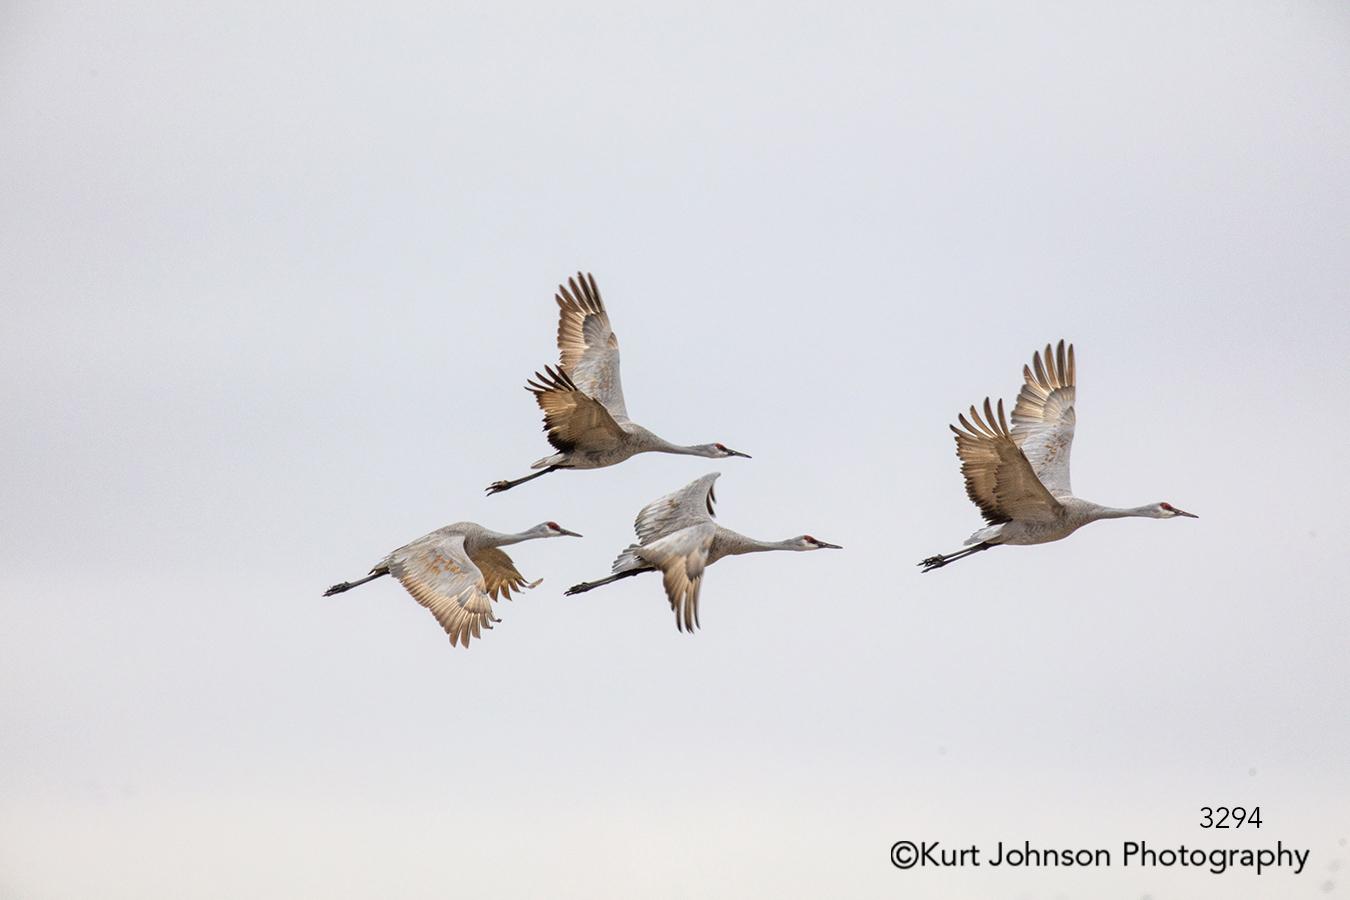 animal bird crane cranes wildlife sky children fly animals